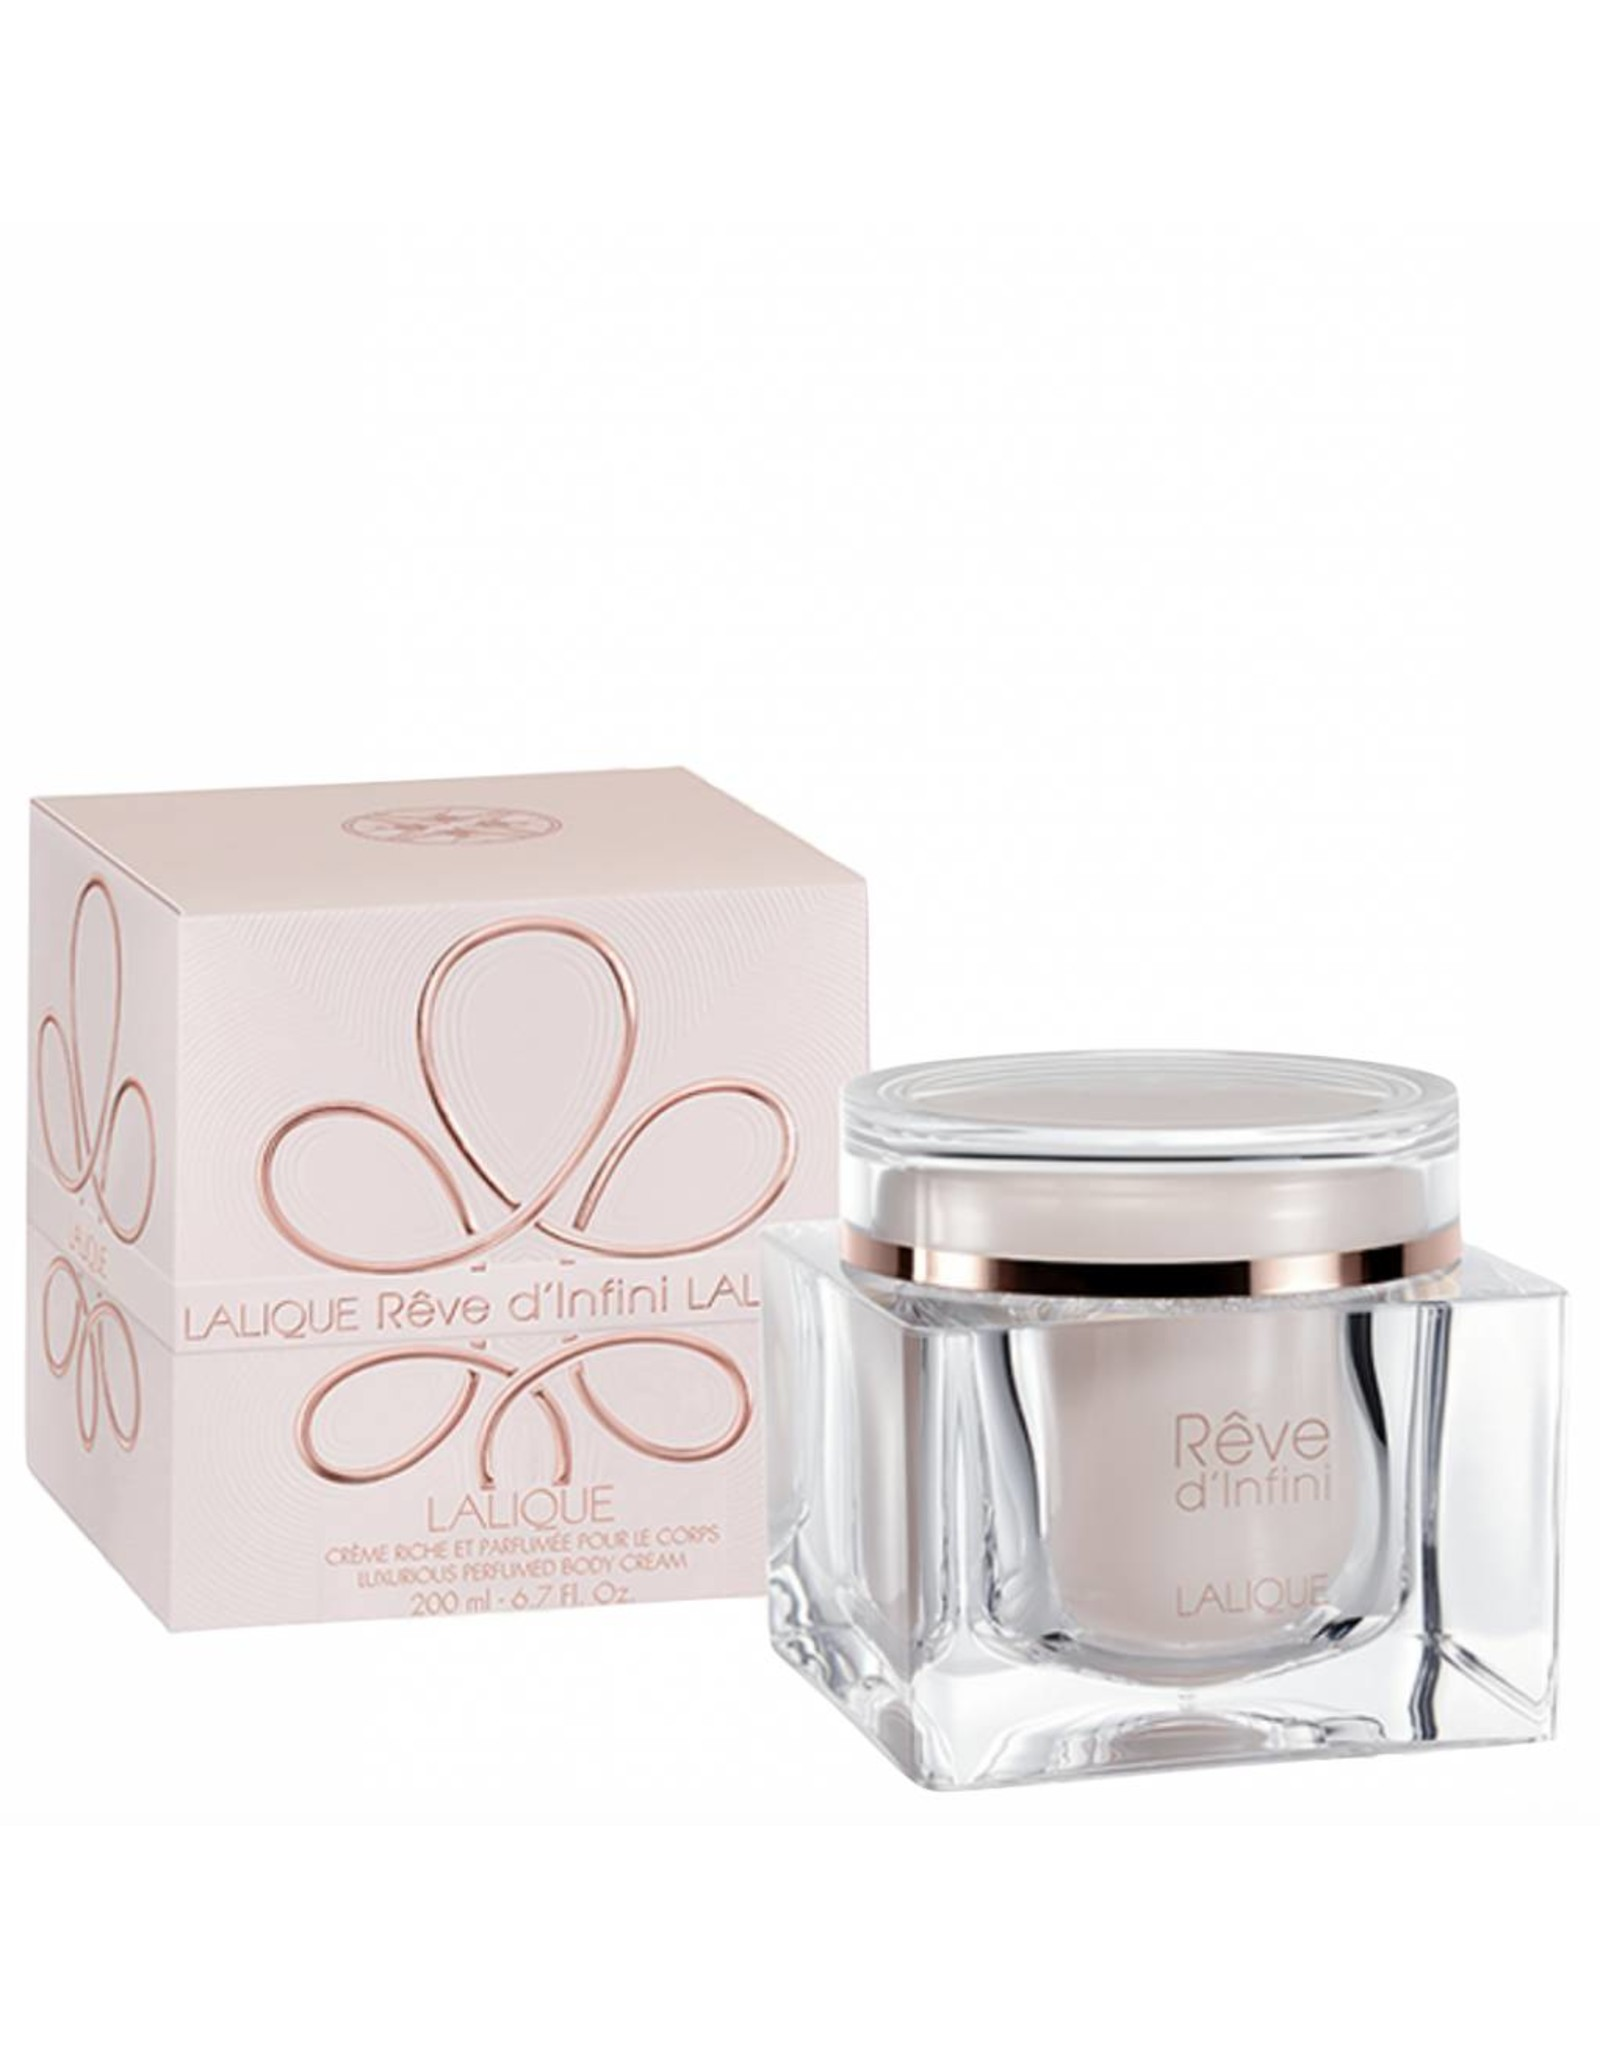 Lalique Rêve d'Infini - Body Cream